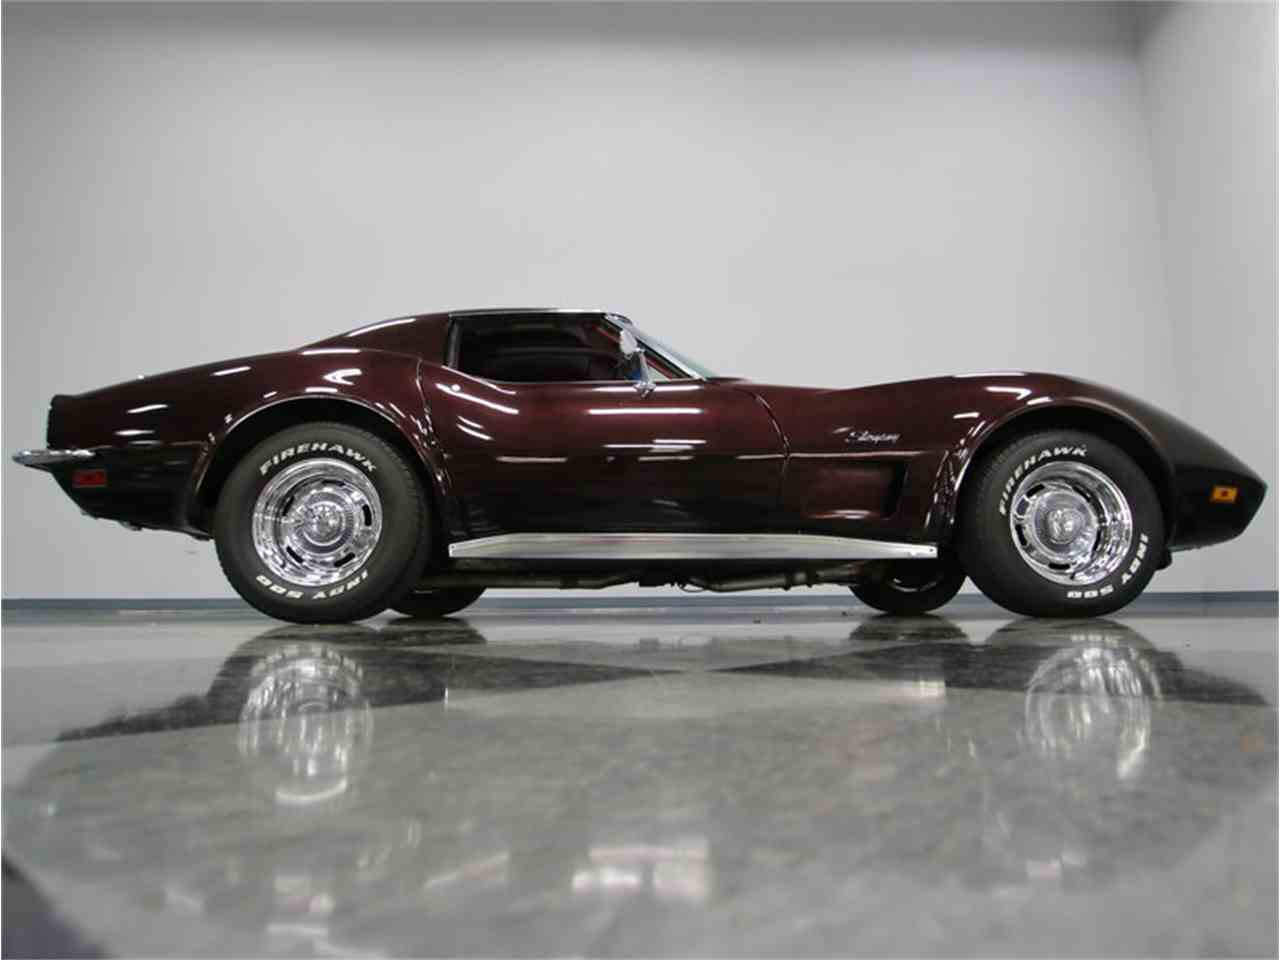 Large Picture of Classic '73 Corvette - $18,995.00 - JLH6